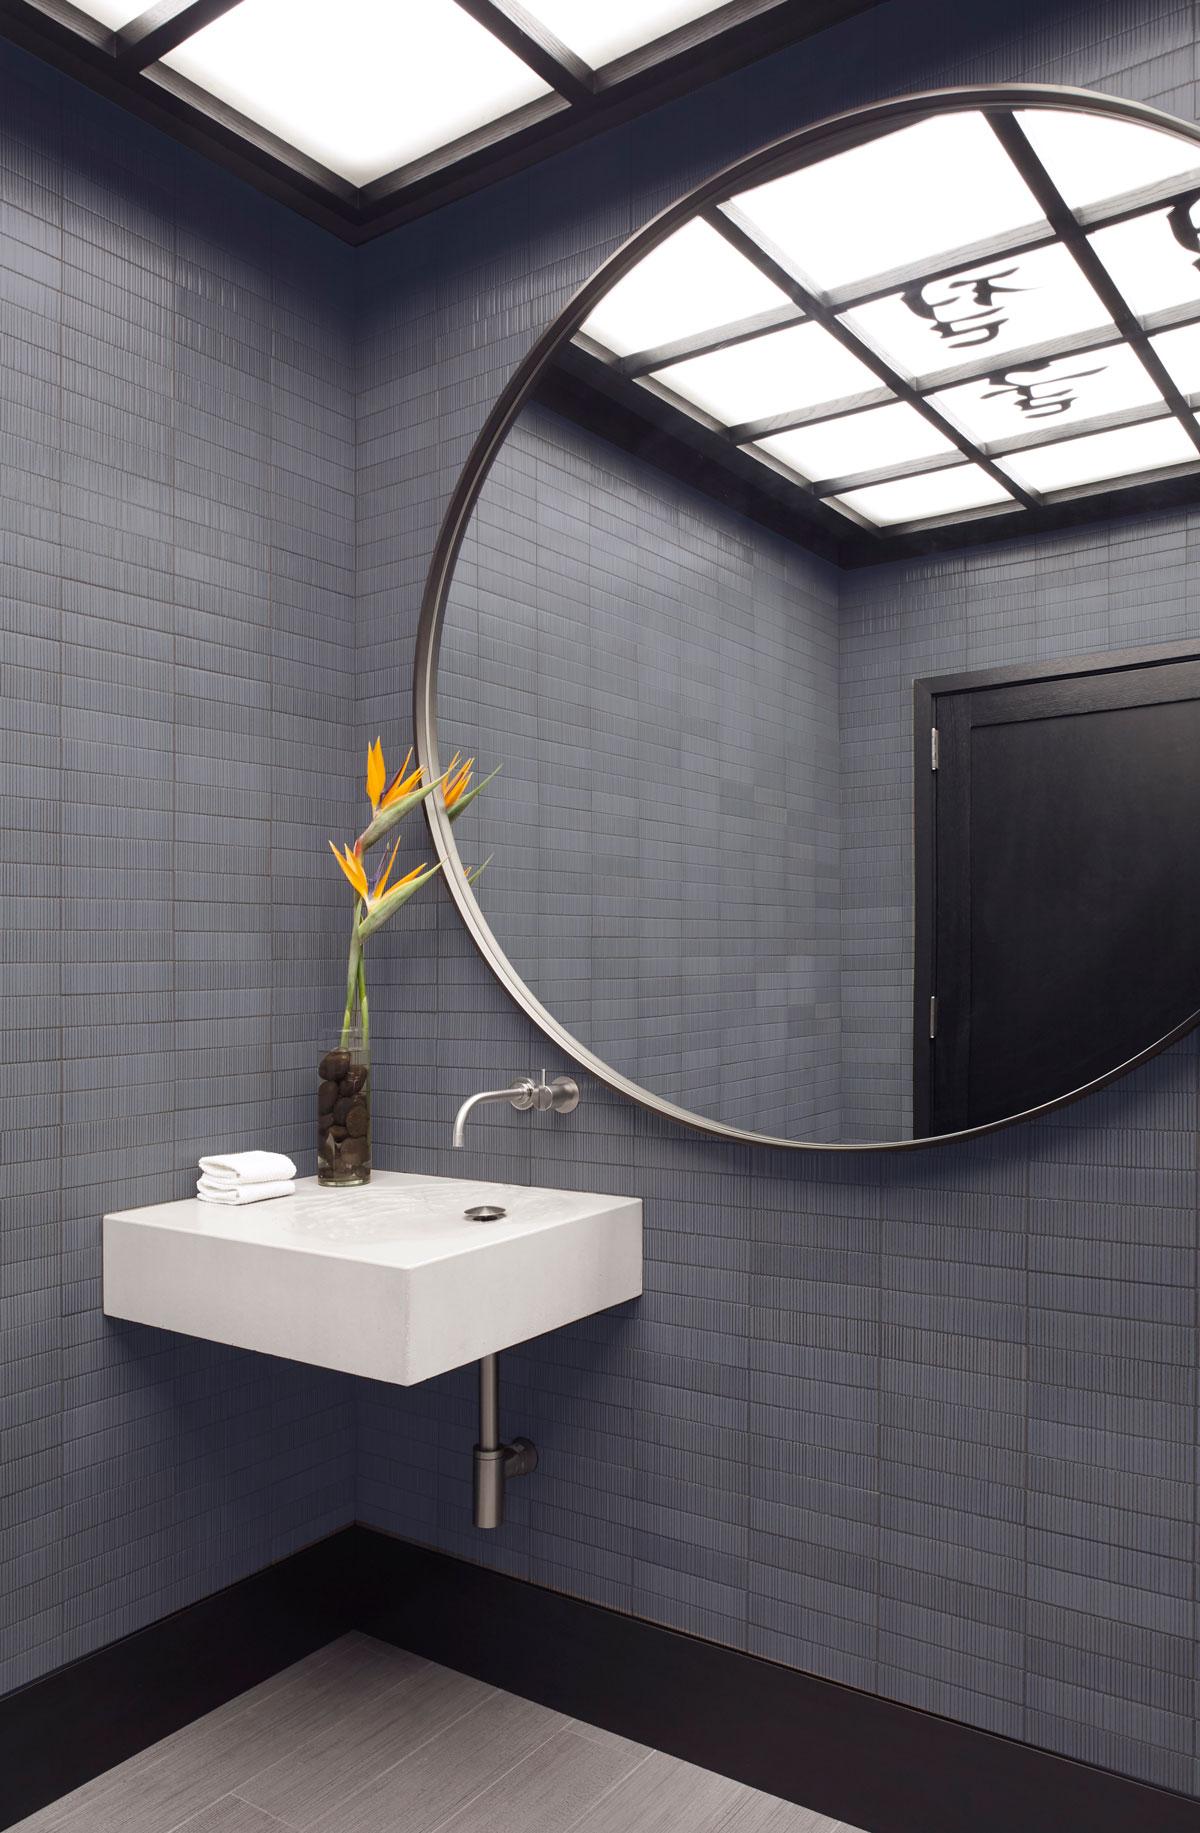 The wabi sabi modern Concrete Erosion Sink by Hard Goods, first designed by Brandon Gore in 2006